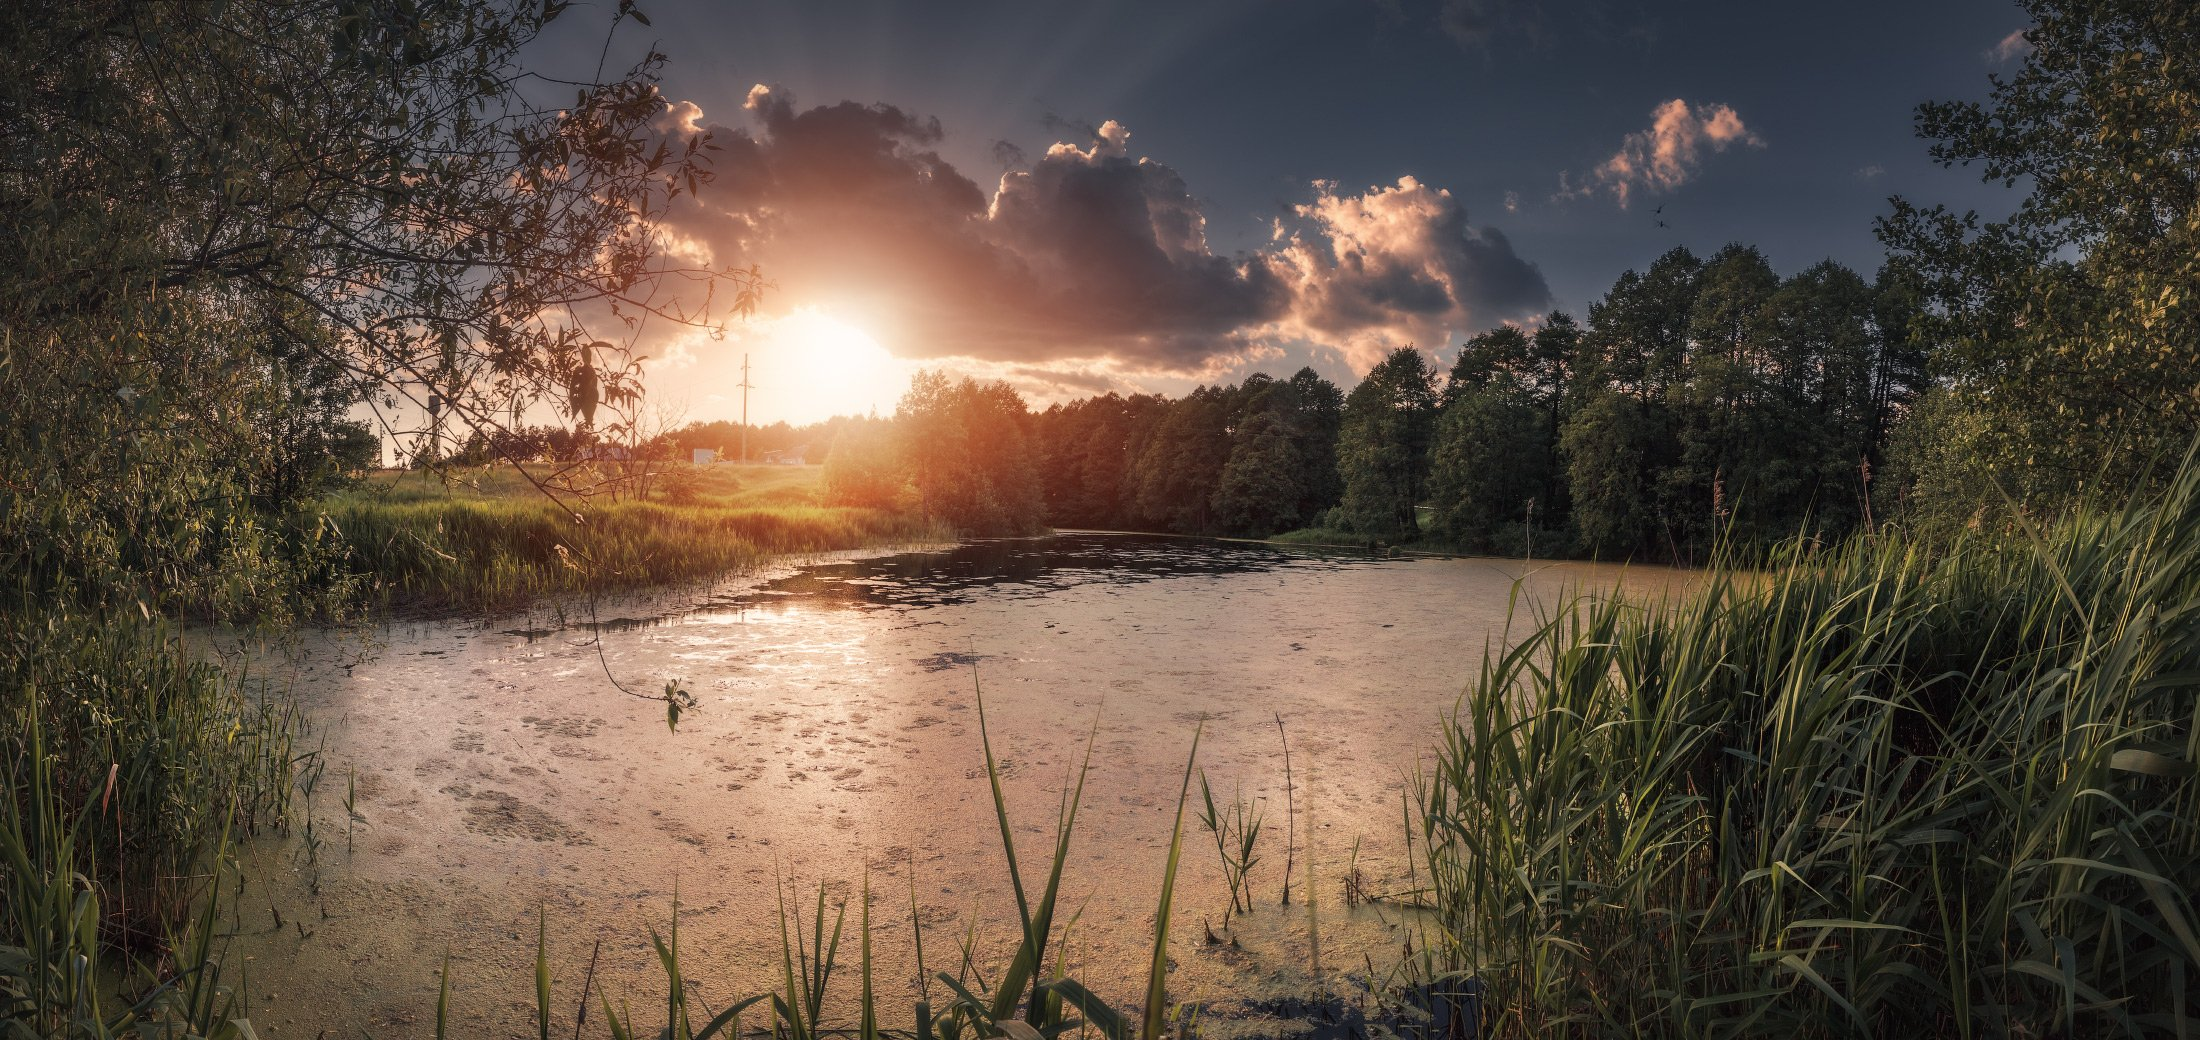 панорама, лето, закат,, Андрей Кровлин